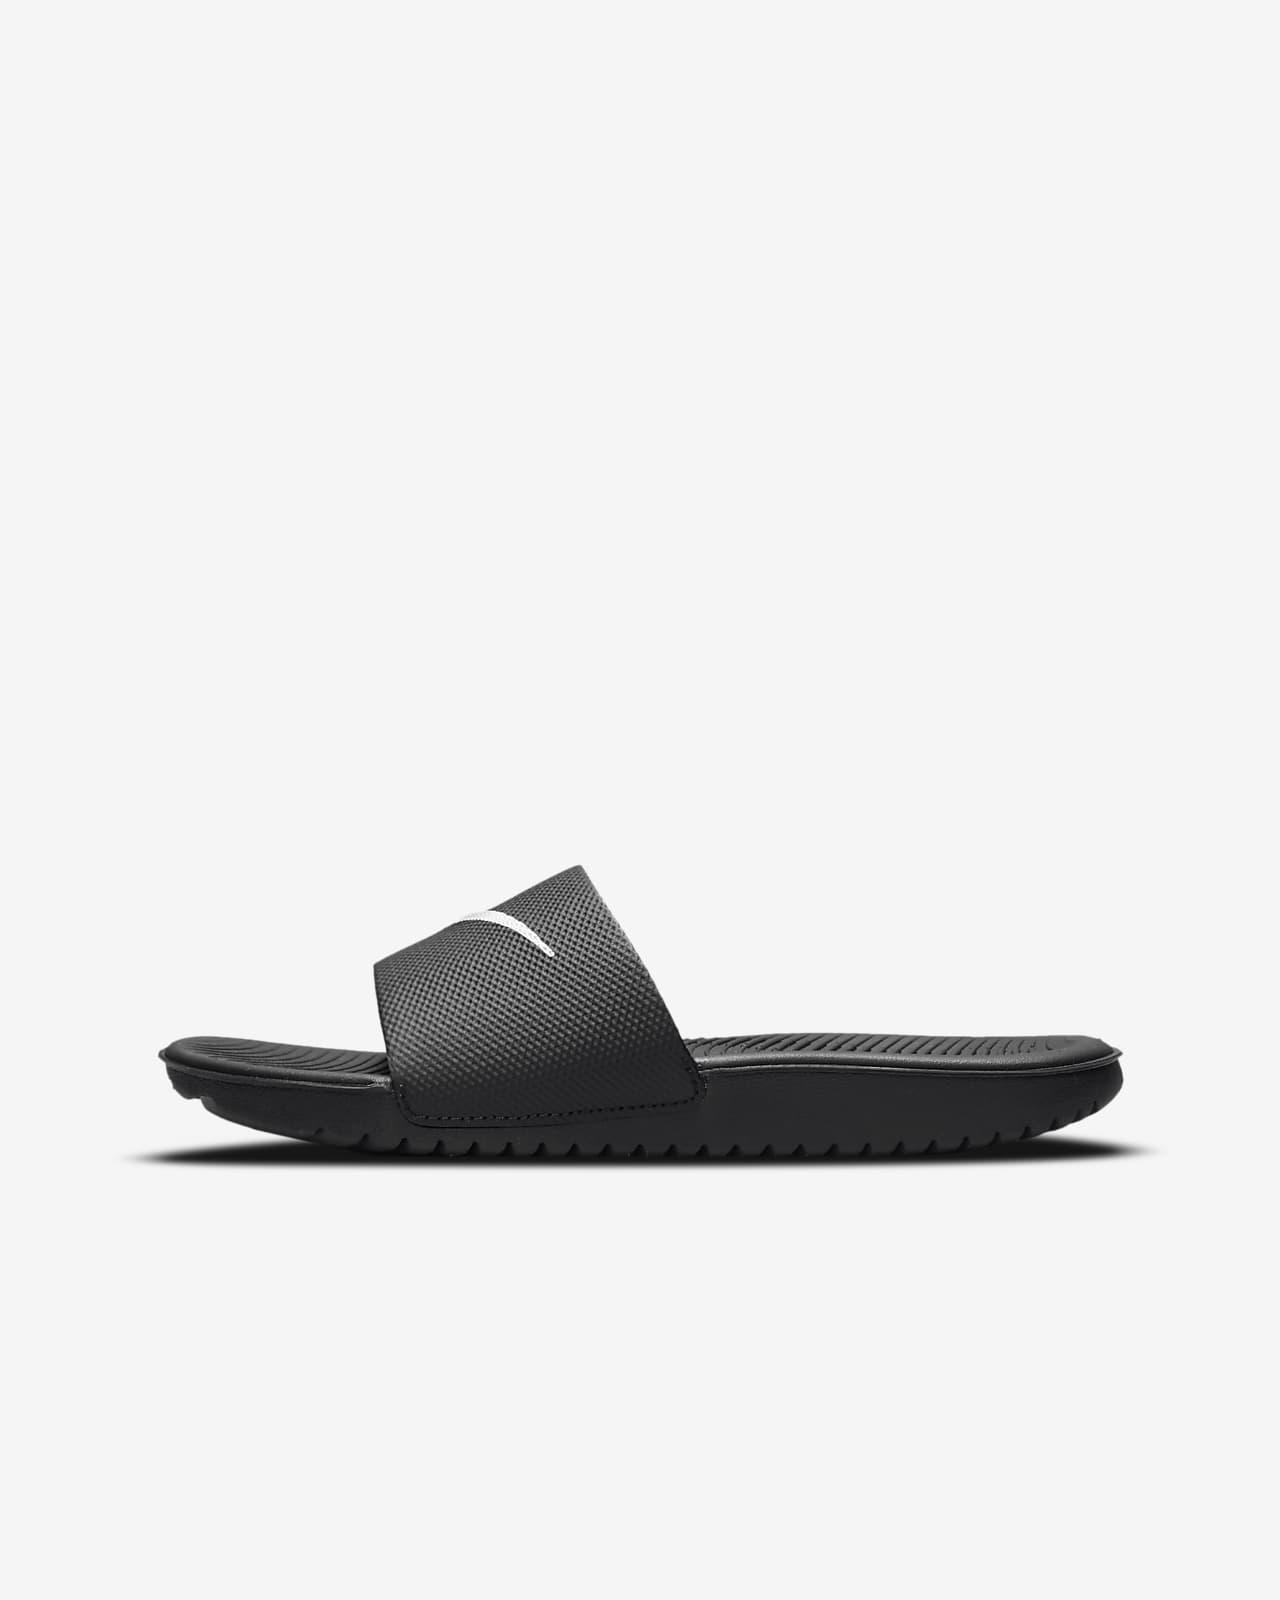 Nike Kawa Slide (GS/PS) 幼童/大童拖鞋